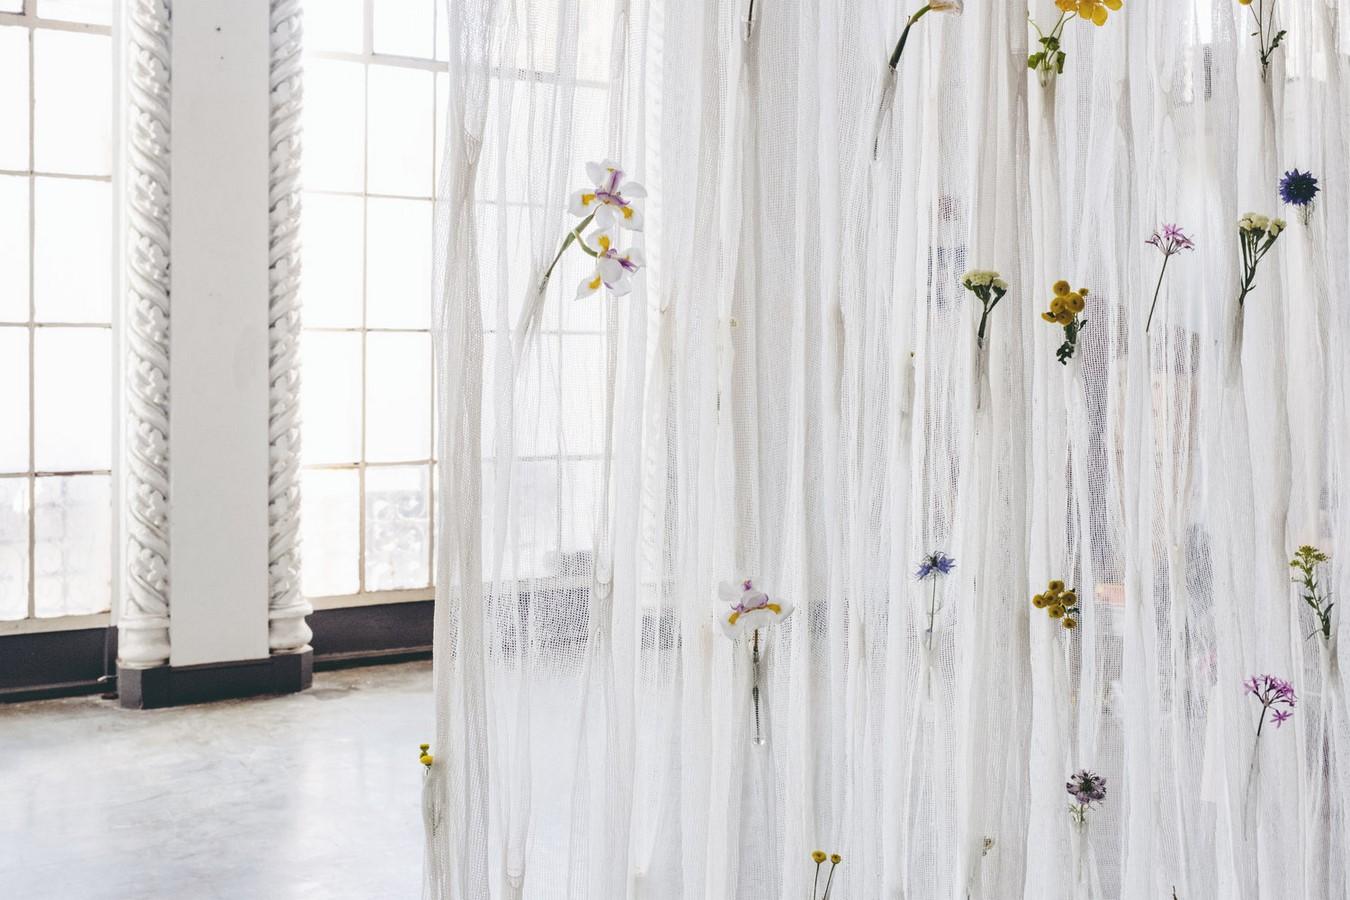 Draped Flowers (Curtain) - Sheet2